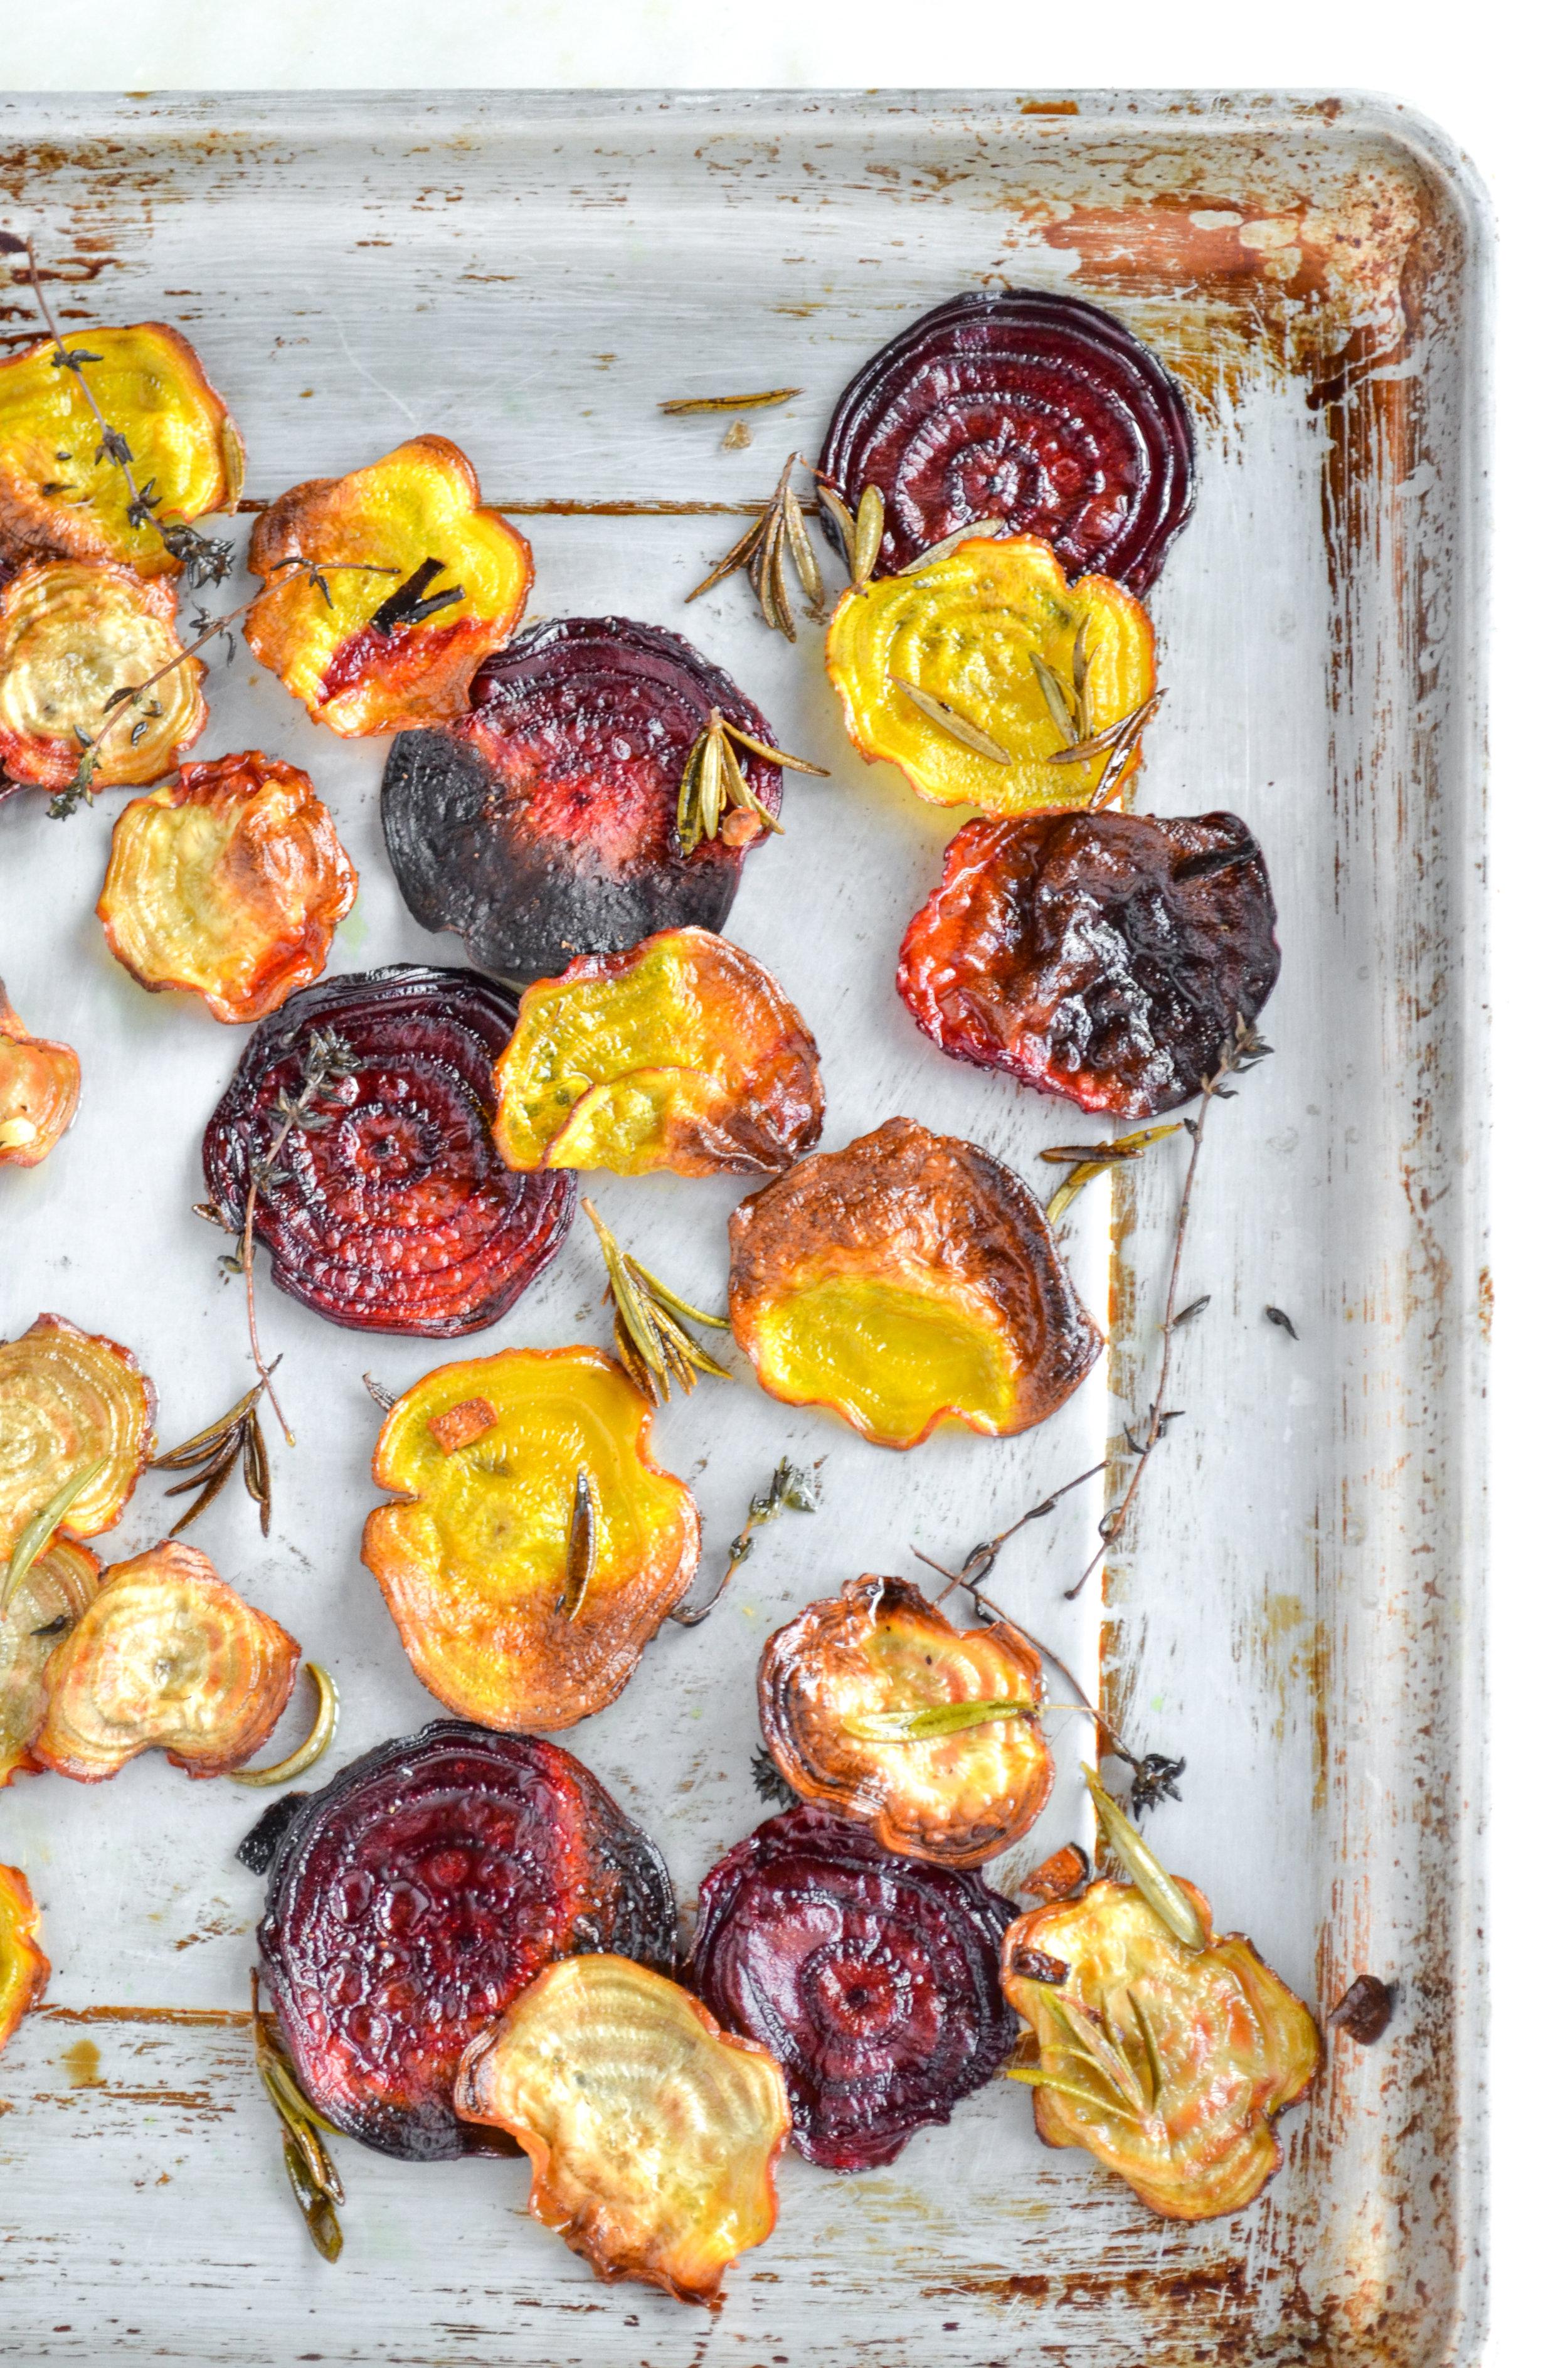 rosemary thyme beet chips // #ShiraRD #paleo #refinedsugarfree #SnacksbyShira